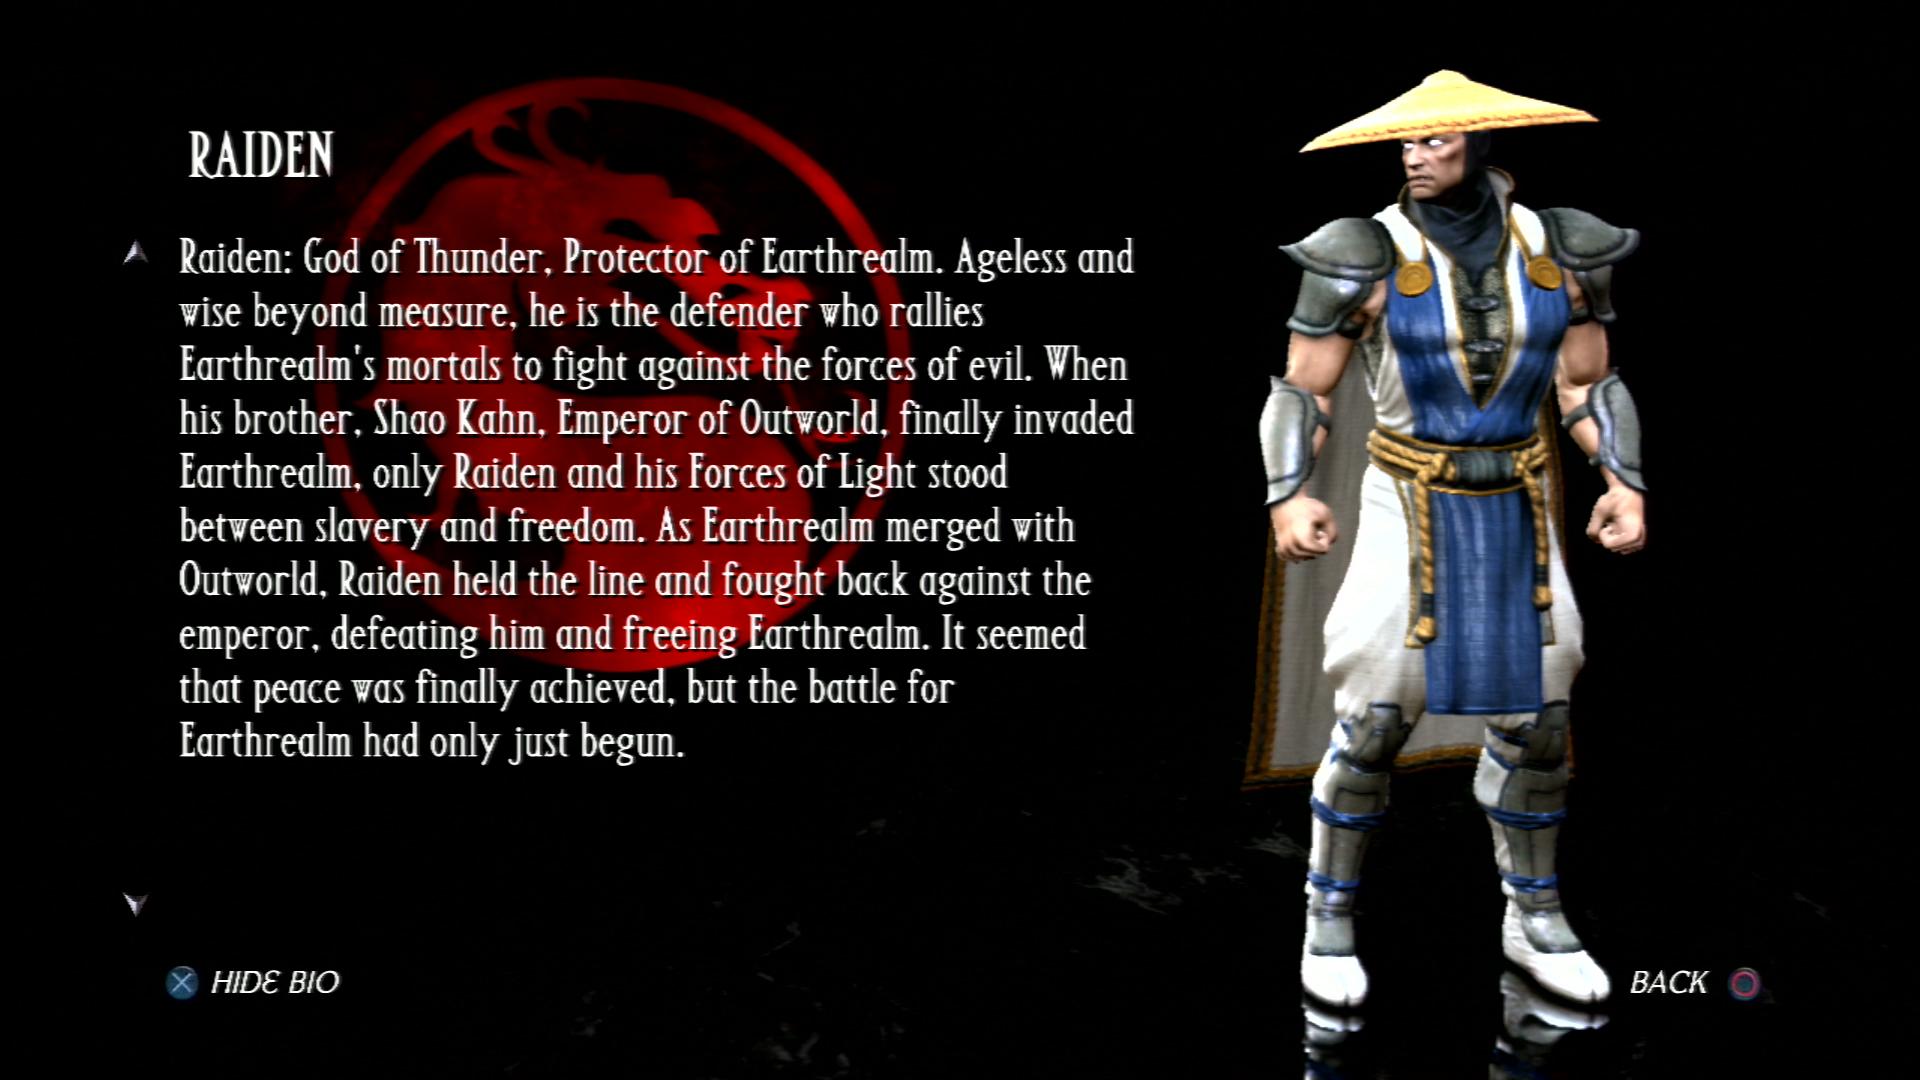 Райден - Mortal Kombat vs. DC Universe Персонаж